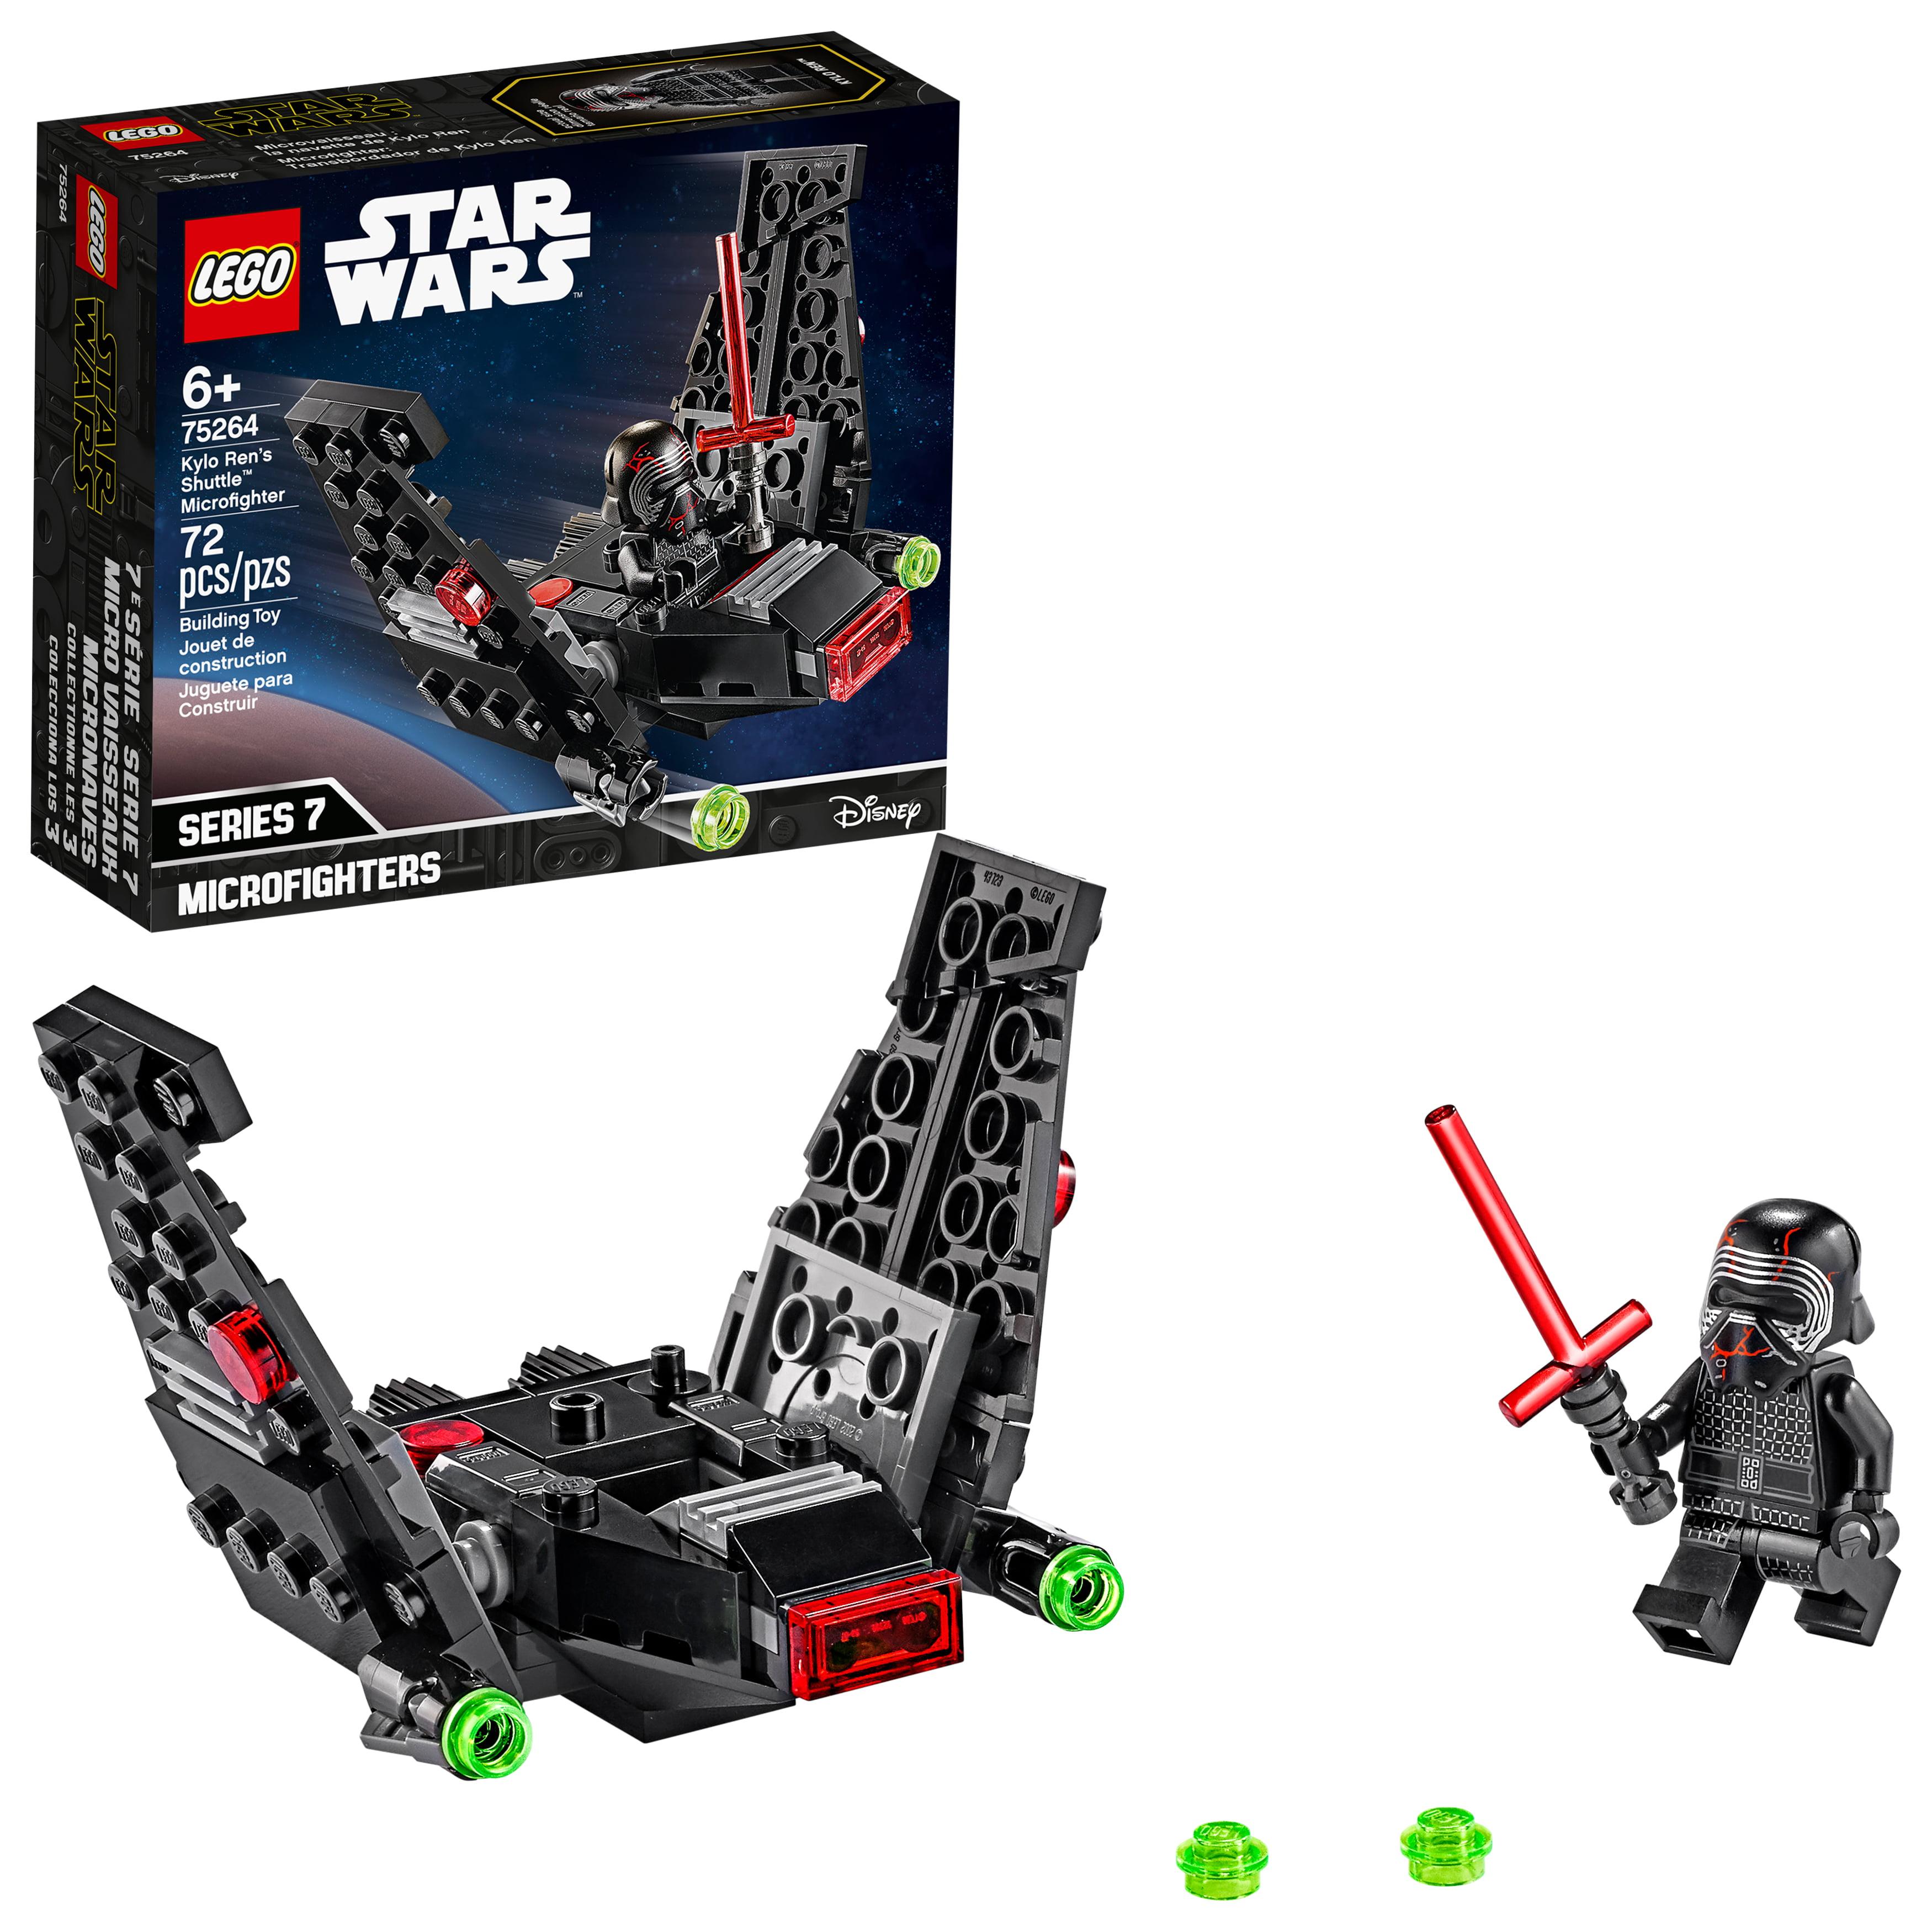 Lego Star Wars Kylo Ren S Shuttle Microfighter 75264 Upsilon Class Shuttle Building Kit 72 Pieces Walmart Com Walmart Com